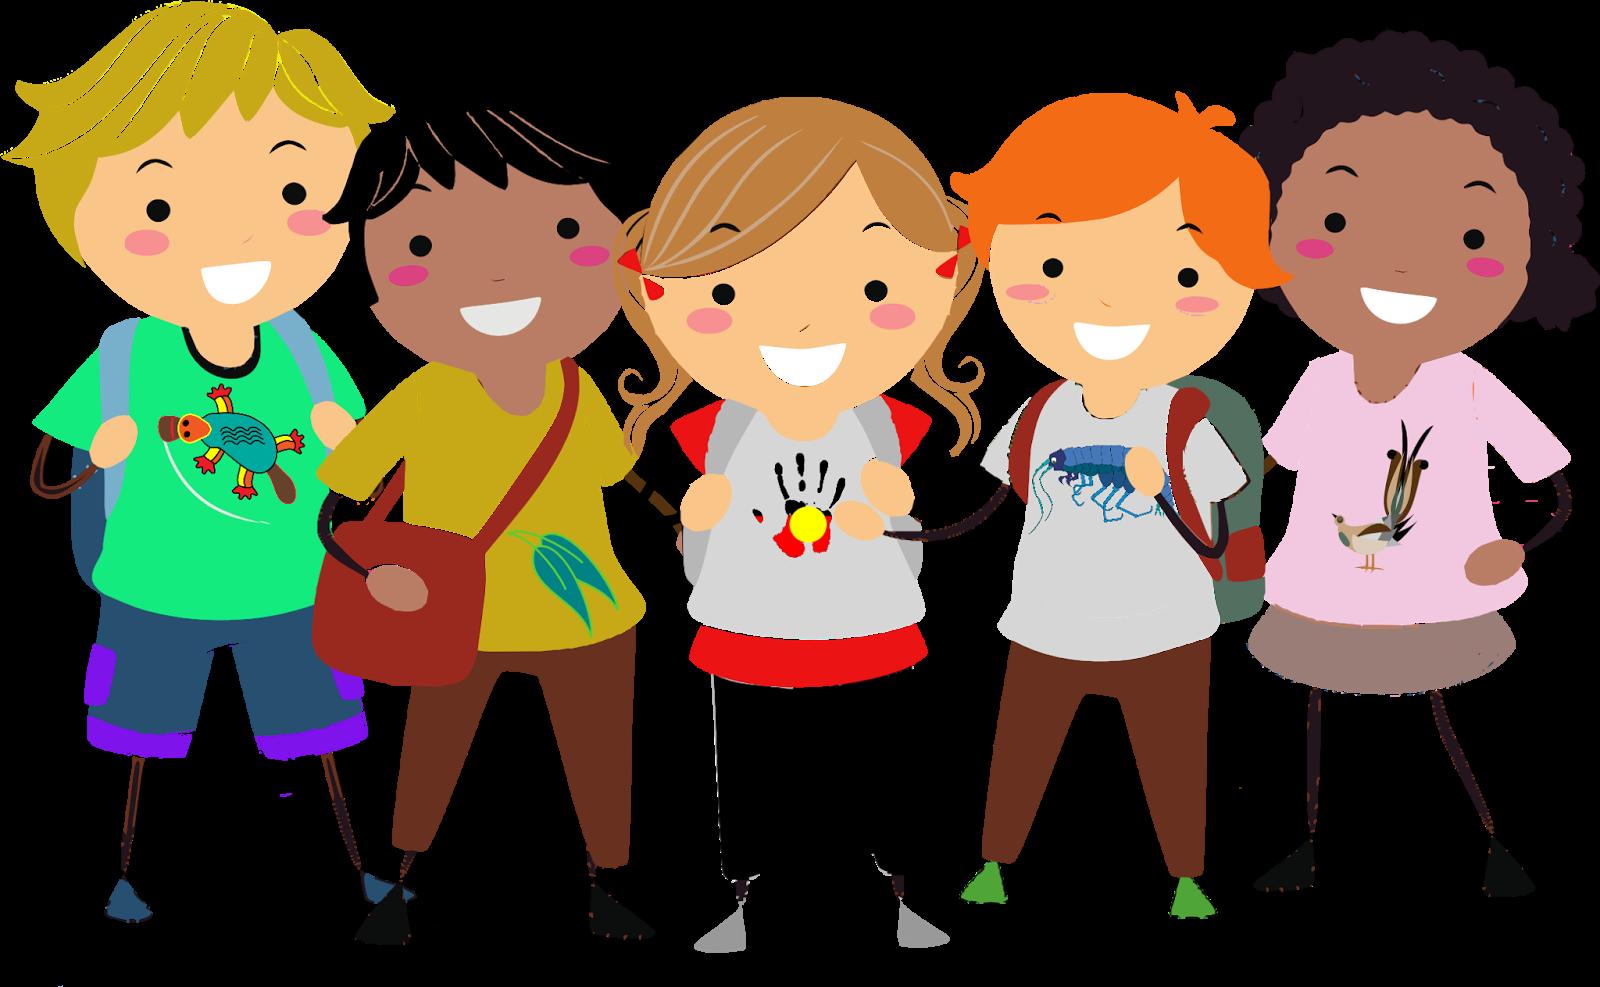 10 cara terbaik mendidik anak agar menjadi baik anak